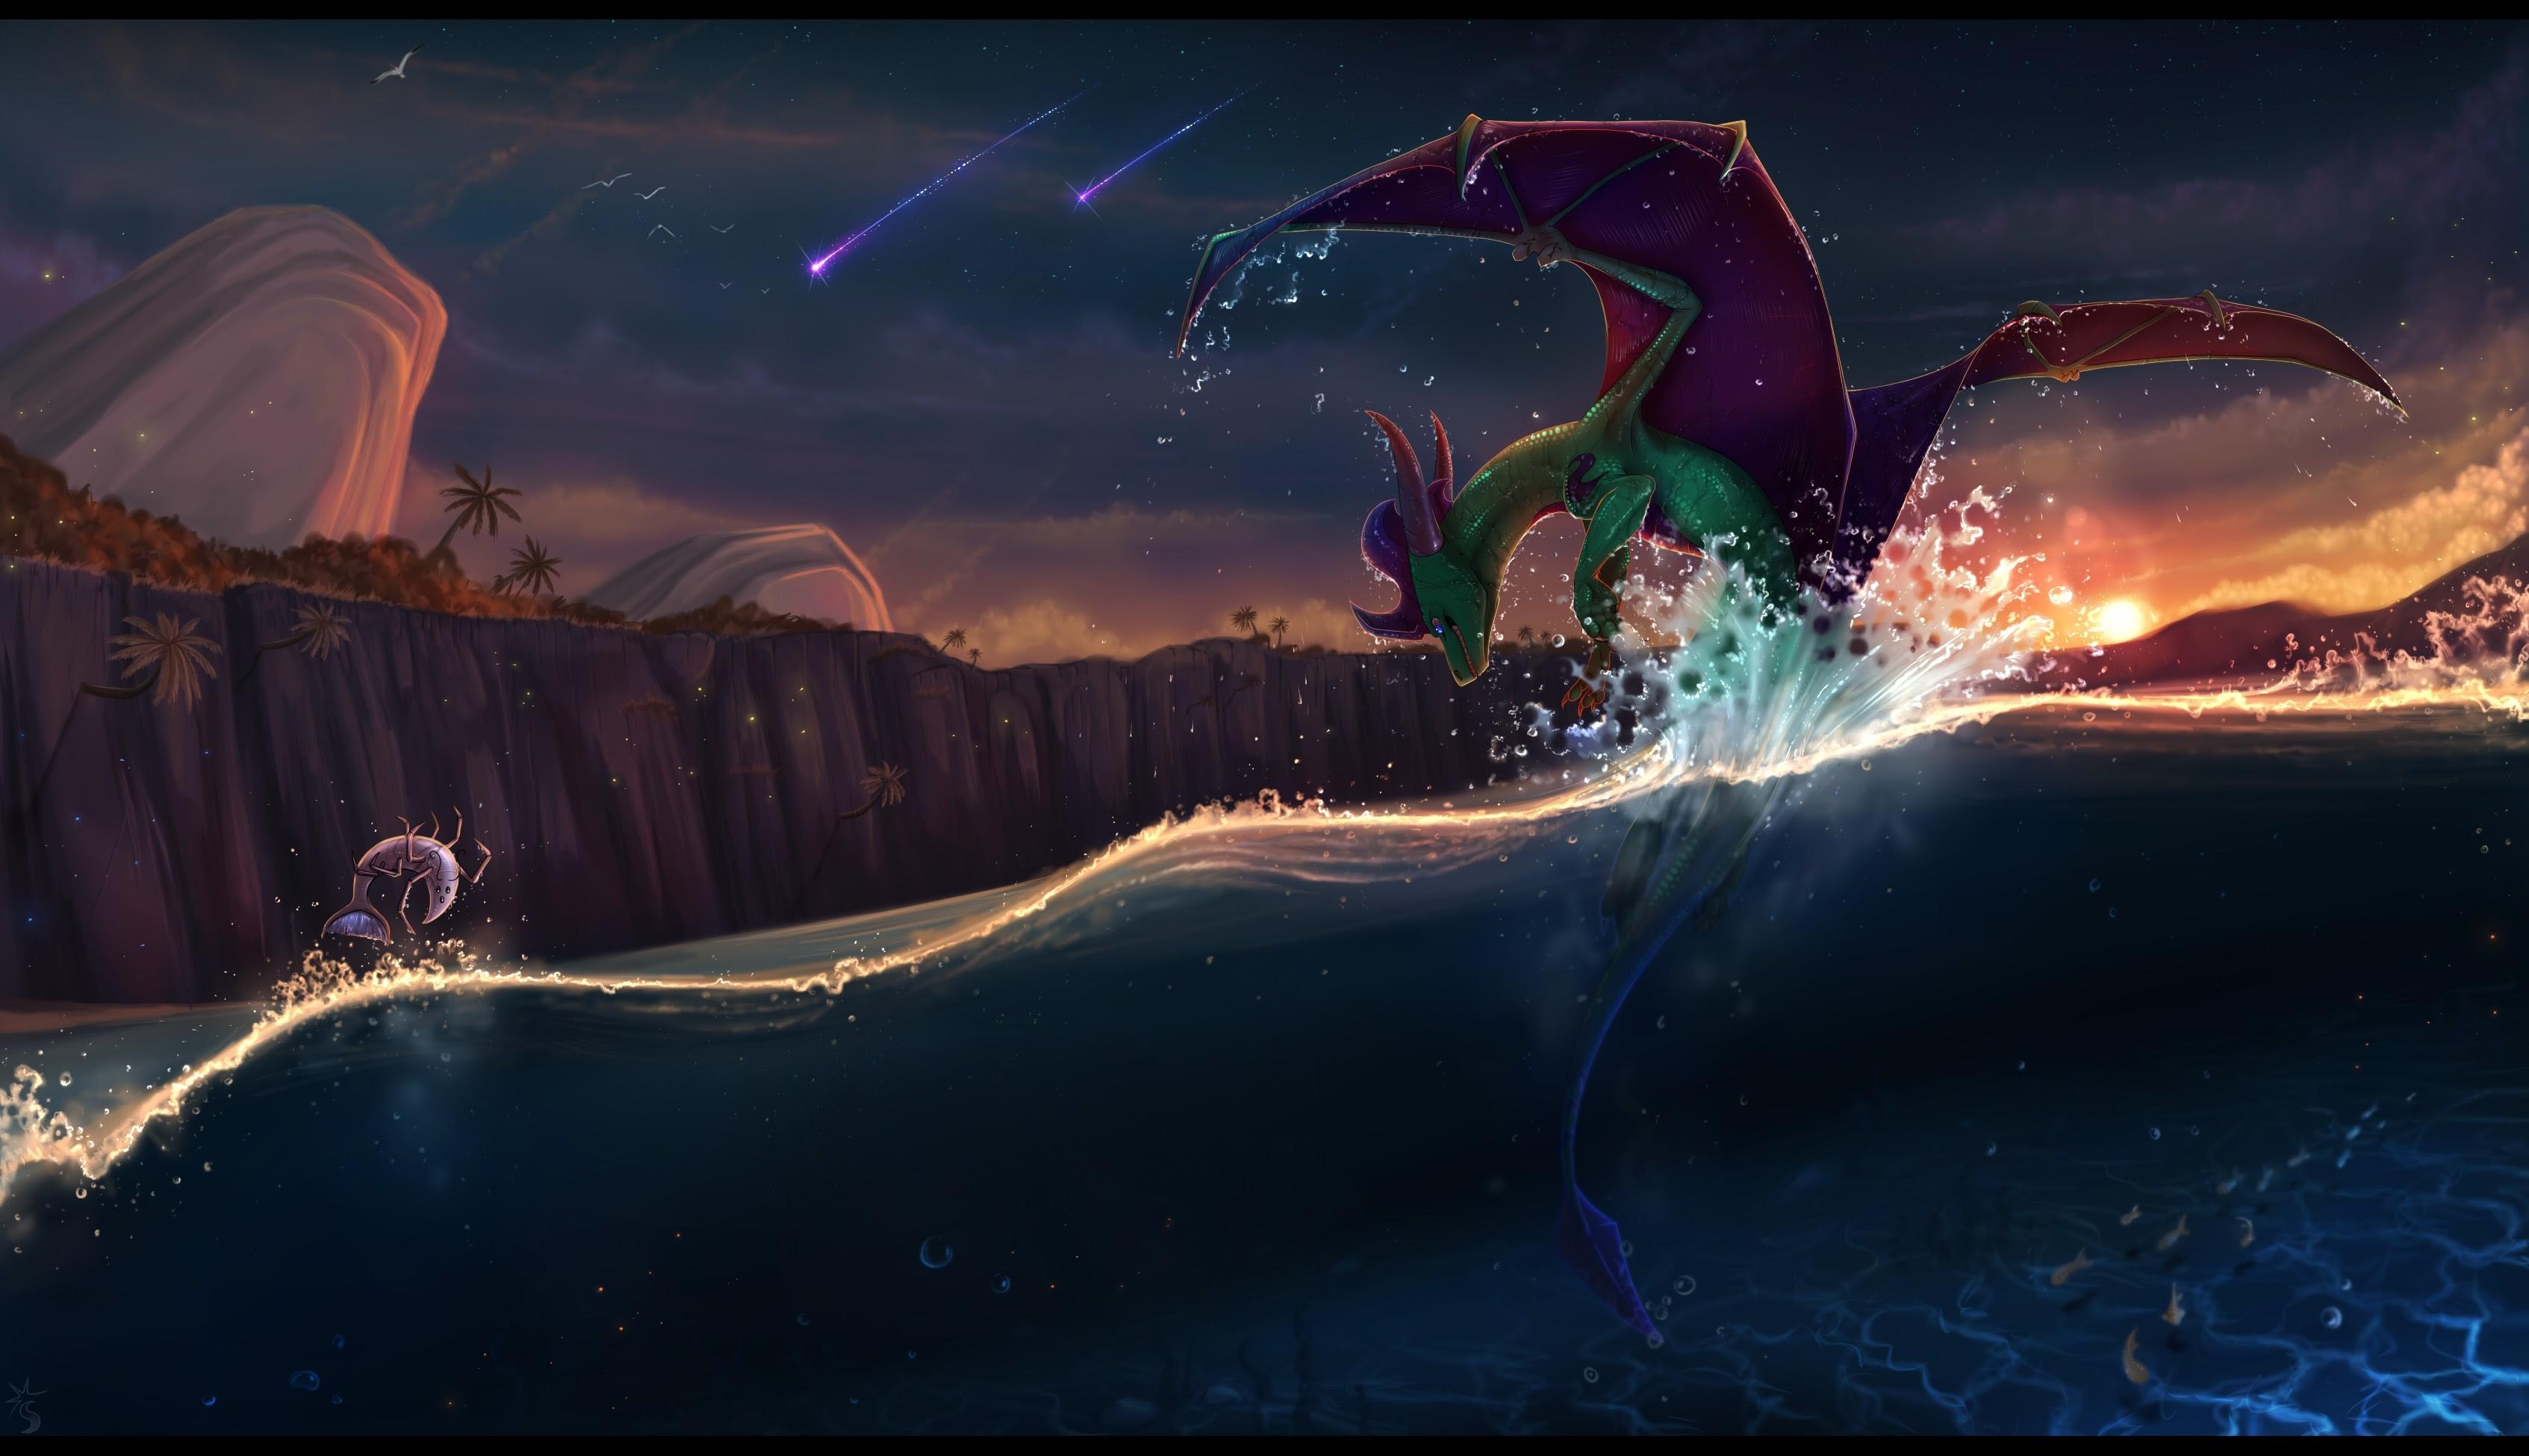 Spyro Wallpaper 74 Images